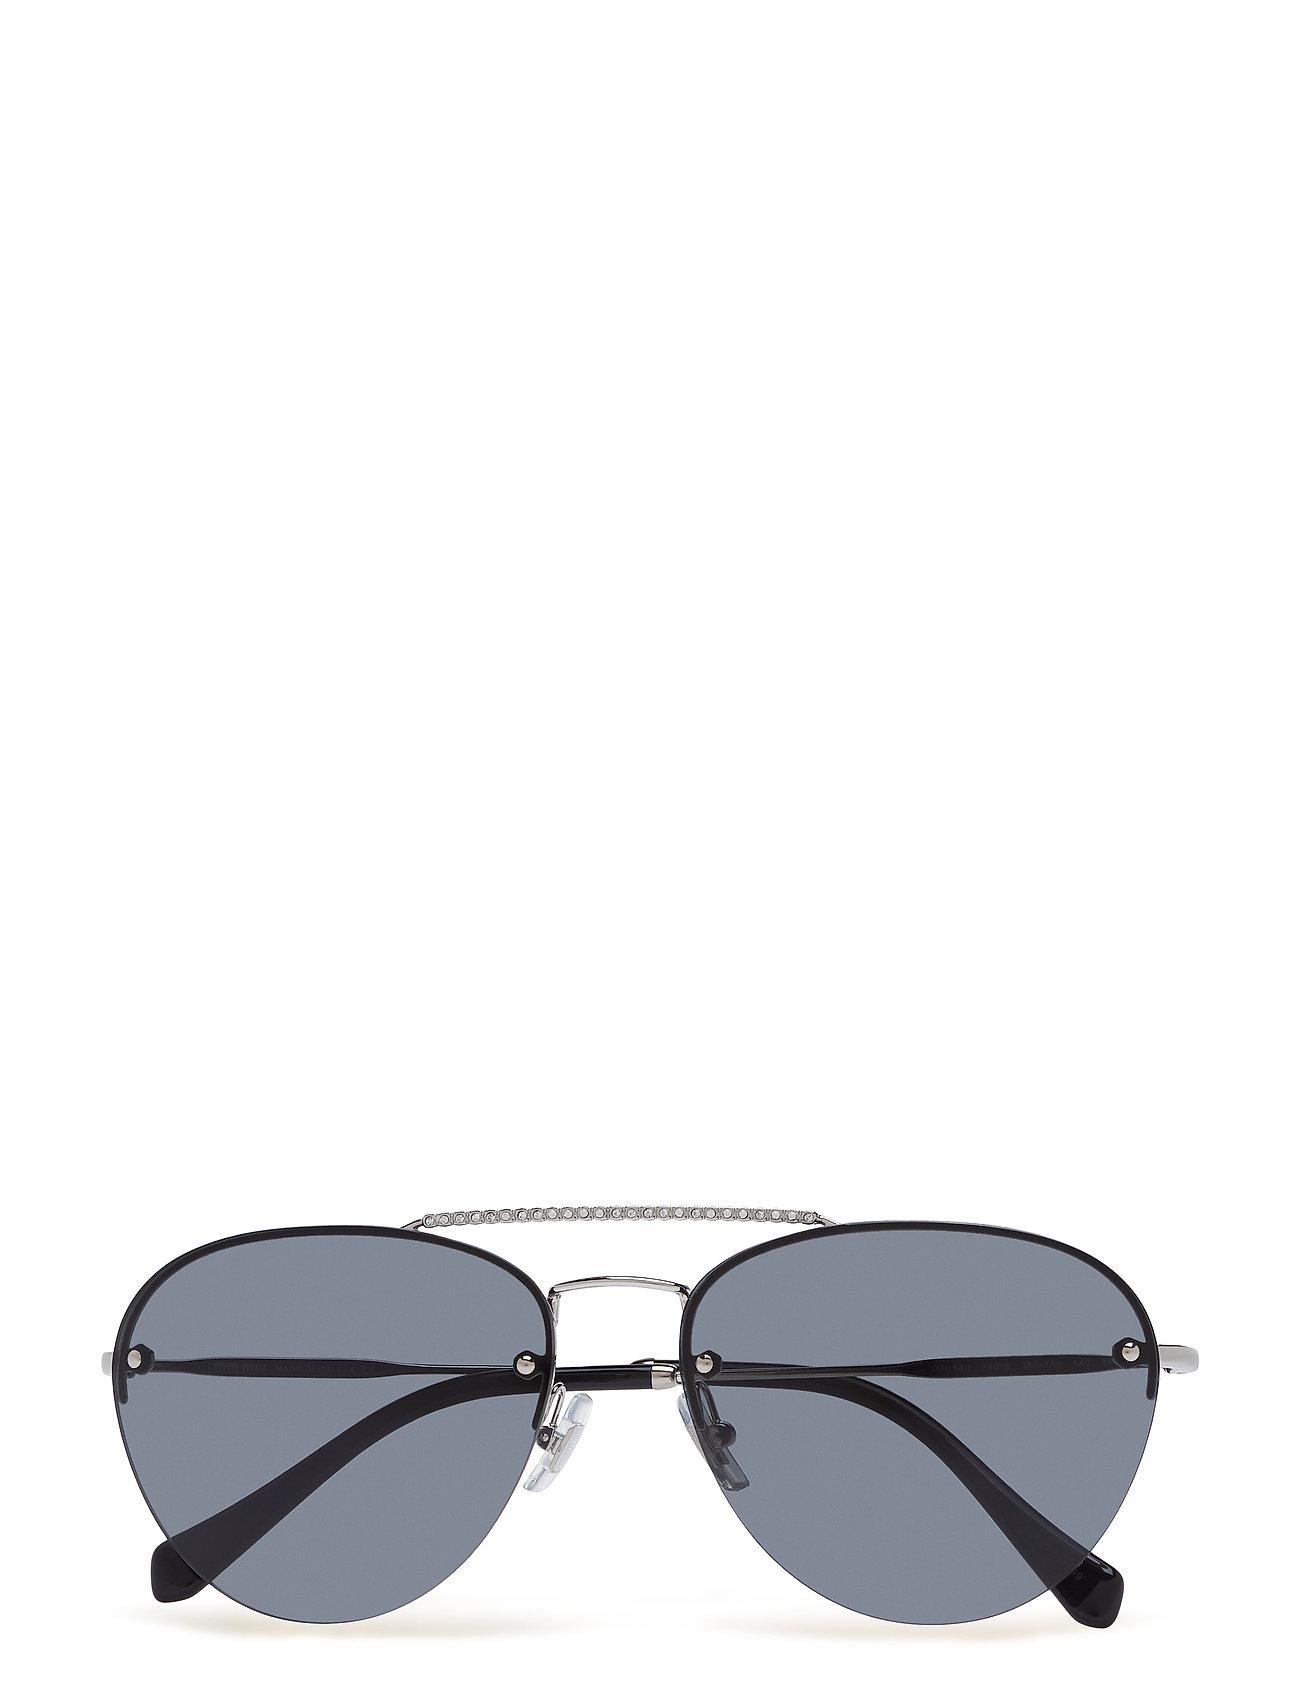 0mu 54us Pilottilasit Aurinkolasit Musta Miu Miu Sunglasses